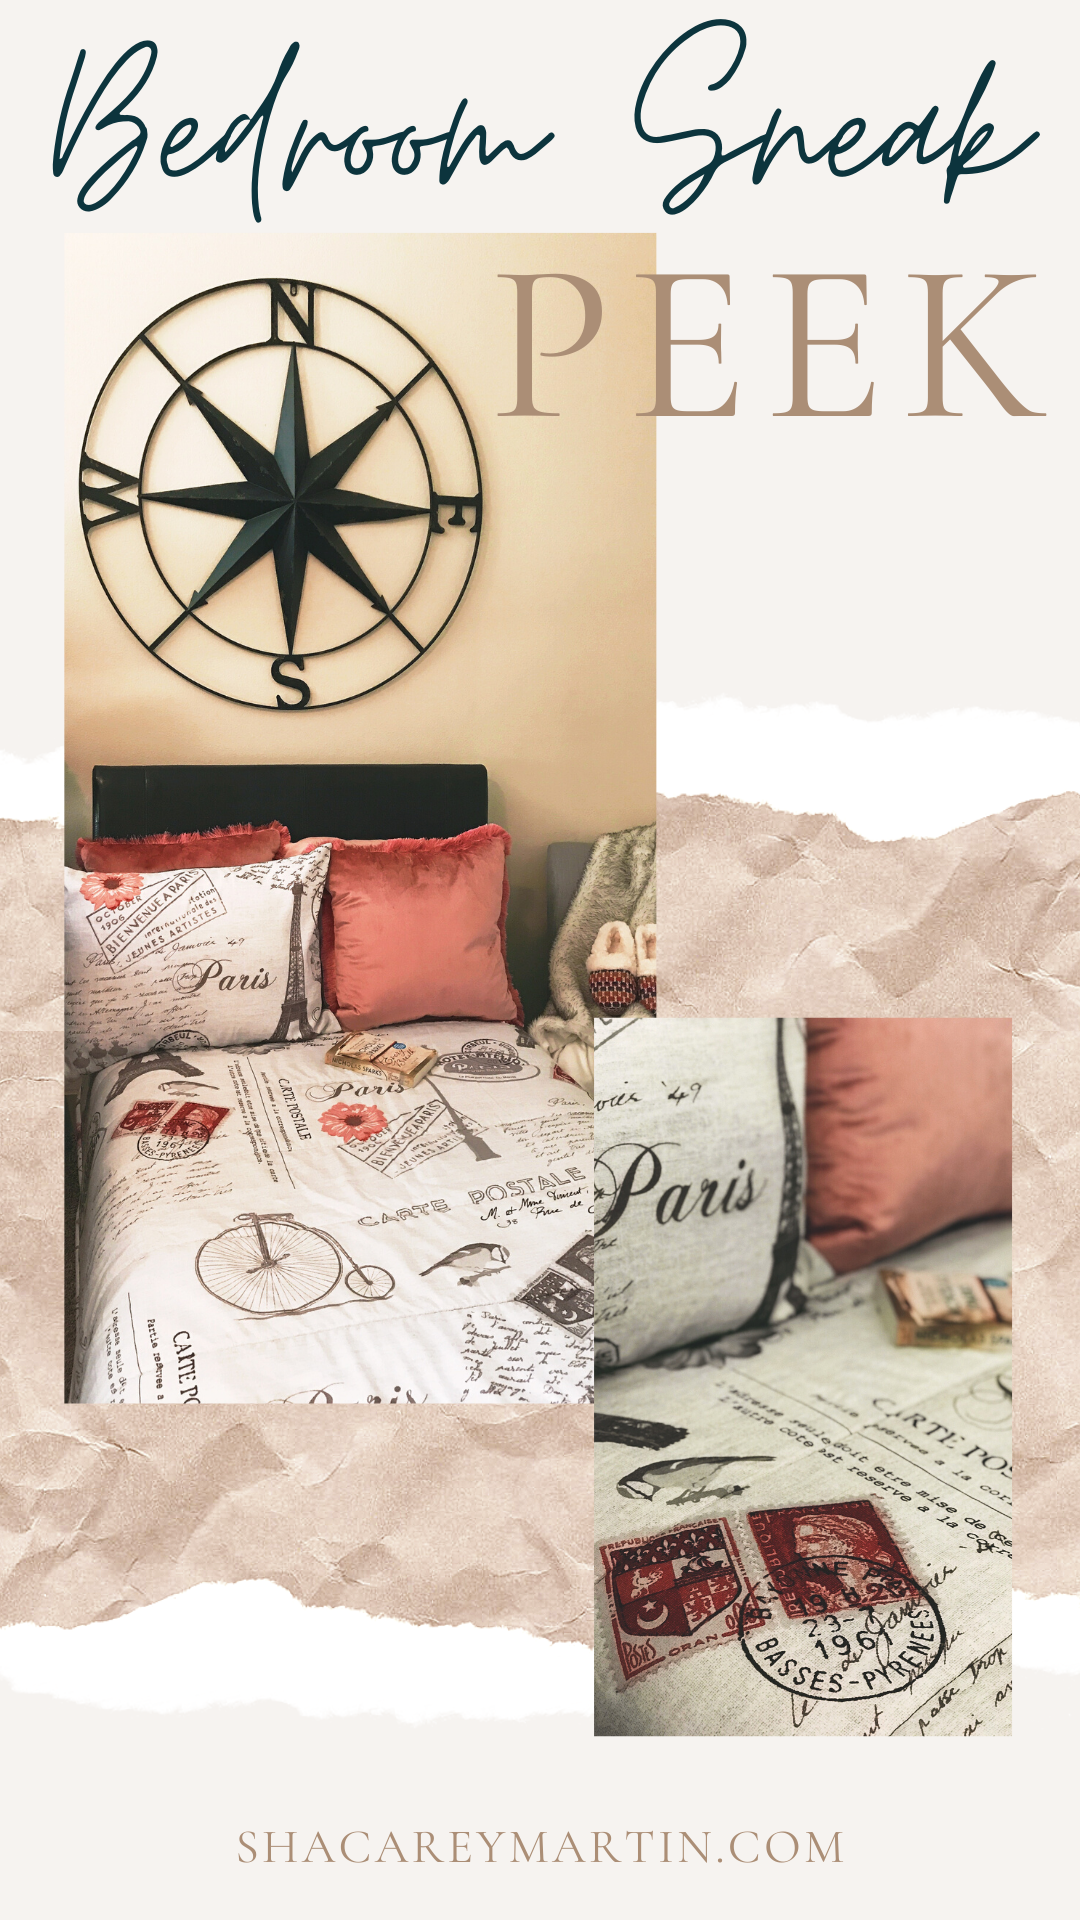 Bedroom Sneak Peek: My Spring Decor (Cozy and Chic) Style